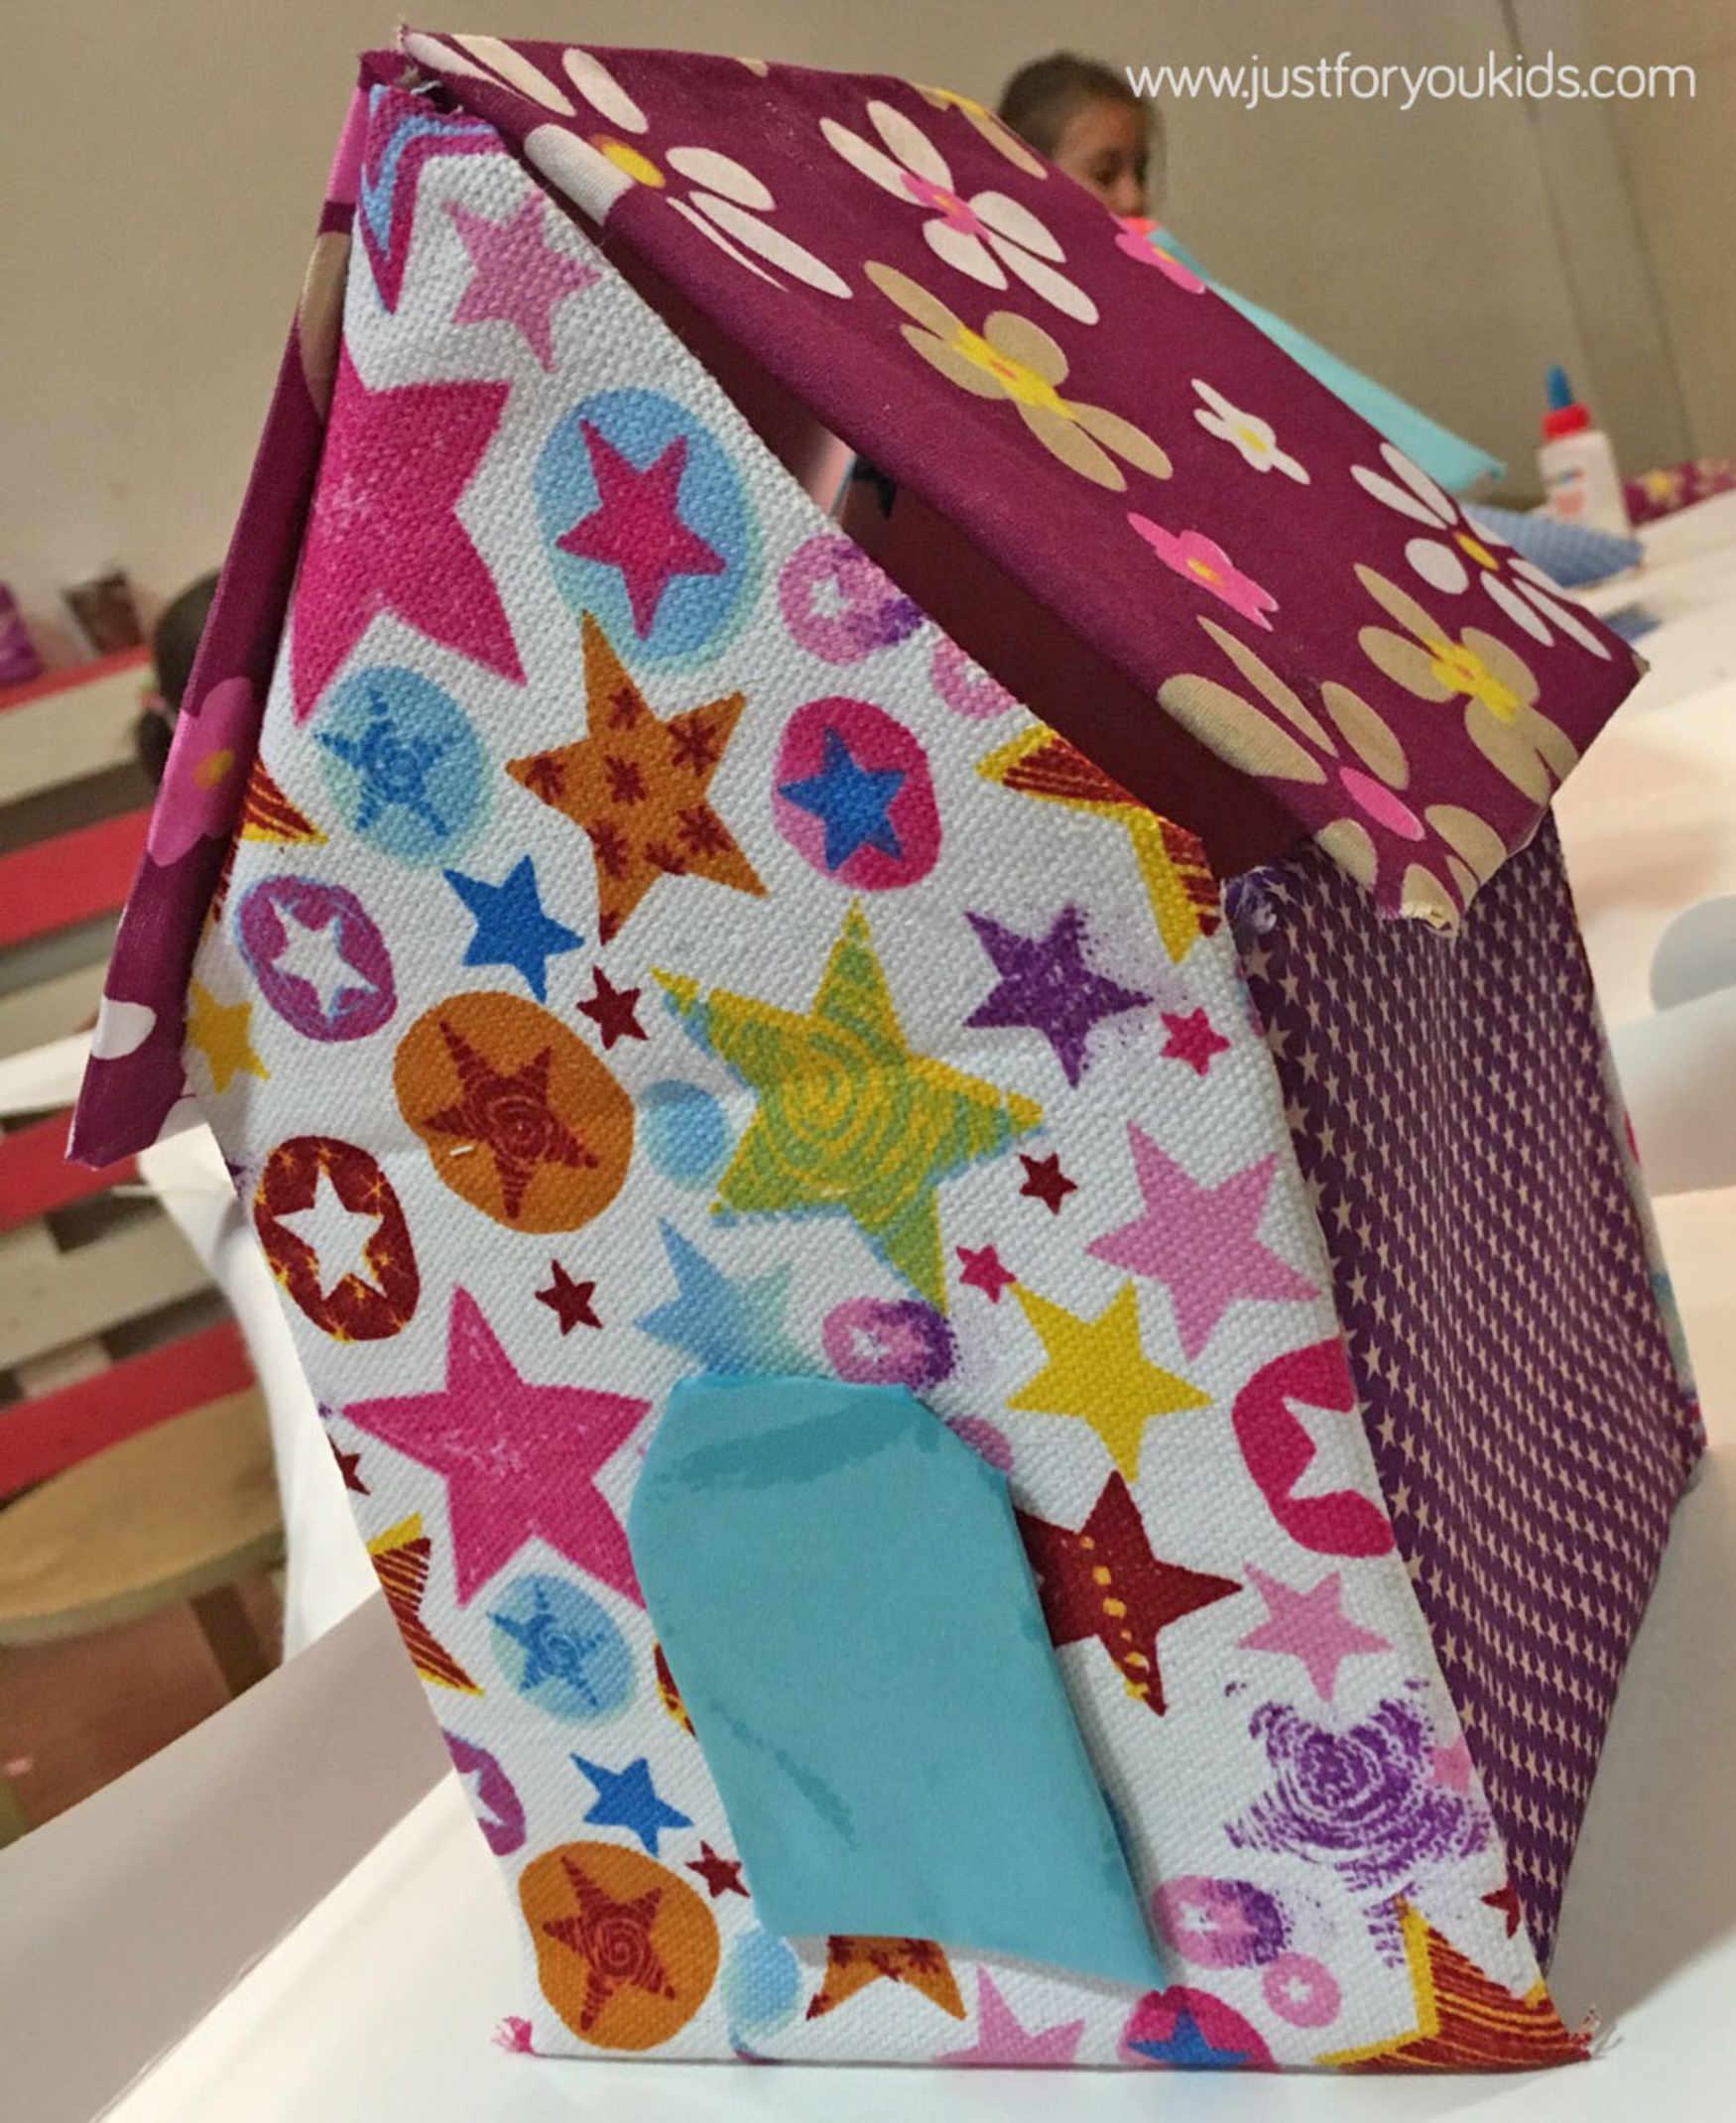 Blog infantil manualidad infantil crea una casita de tela - Casita tela ninos ...